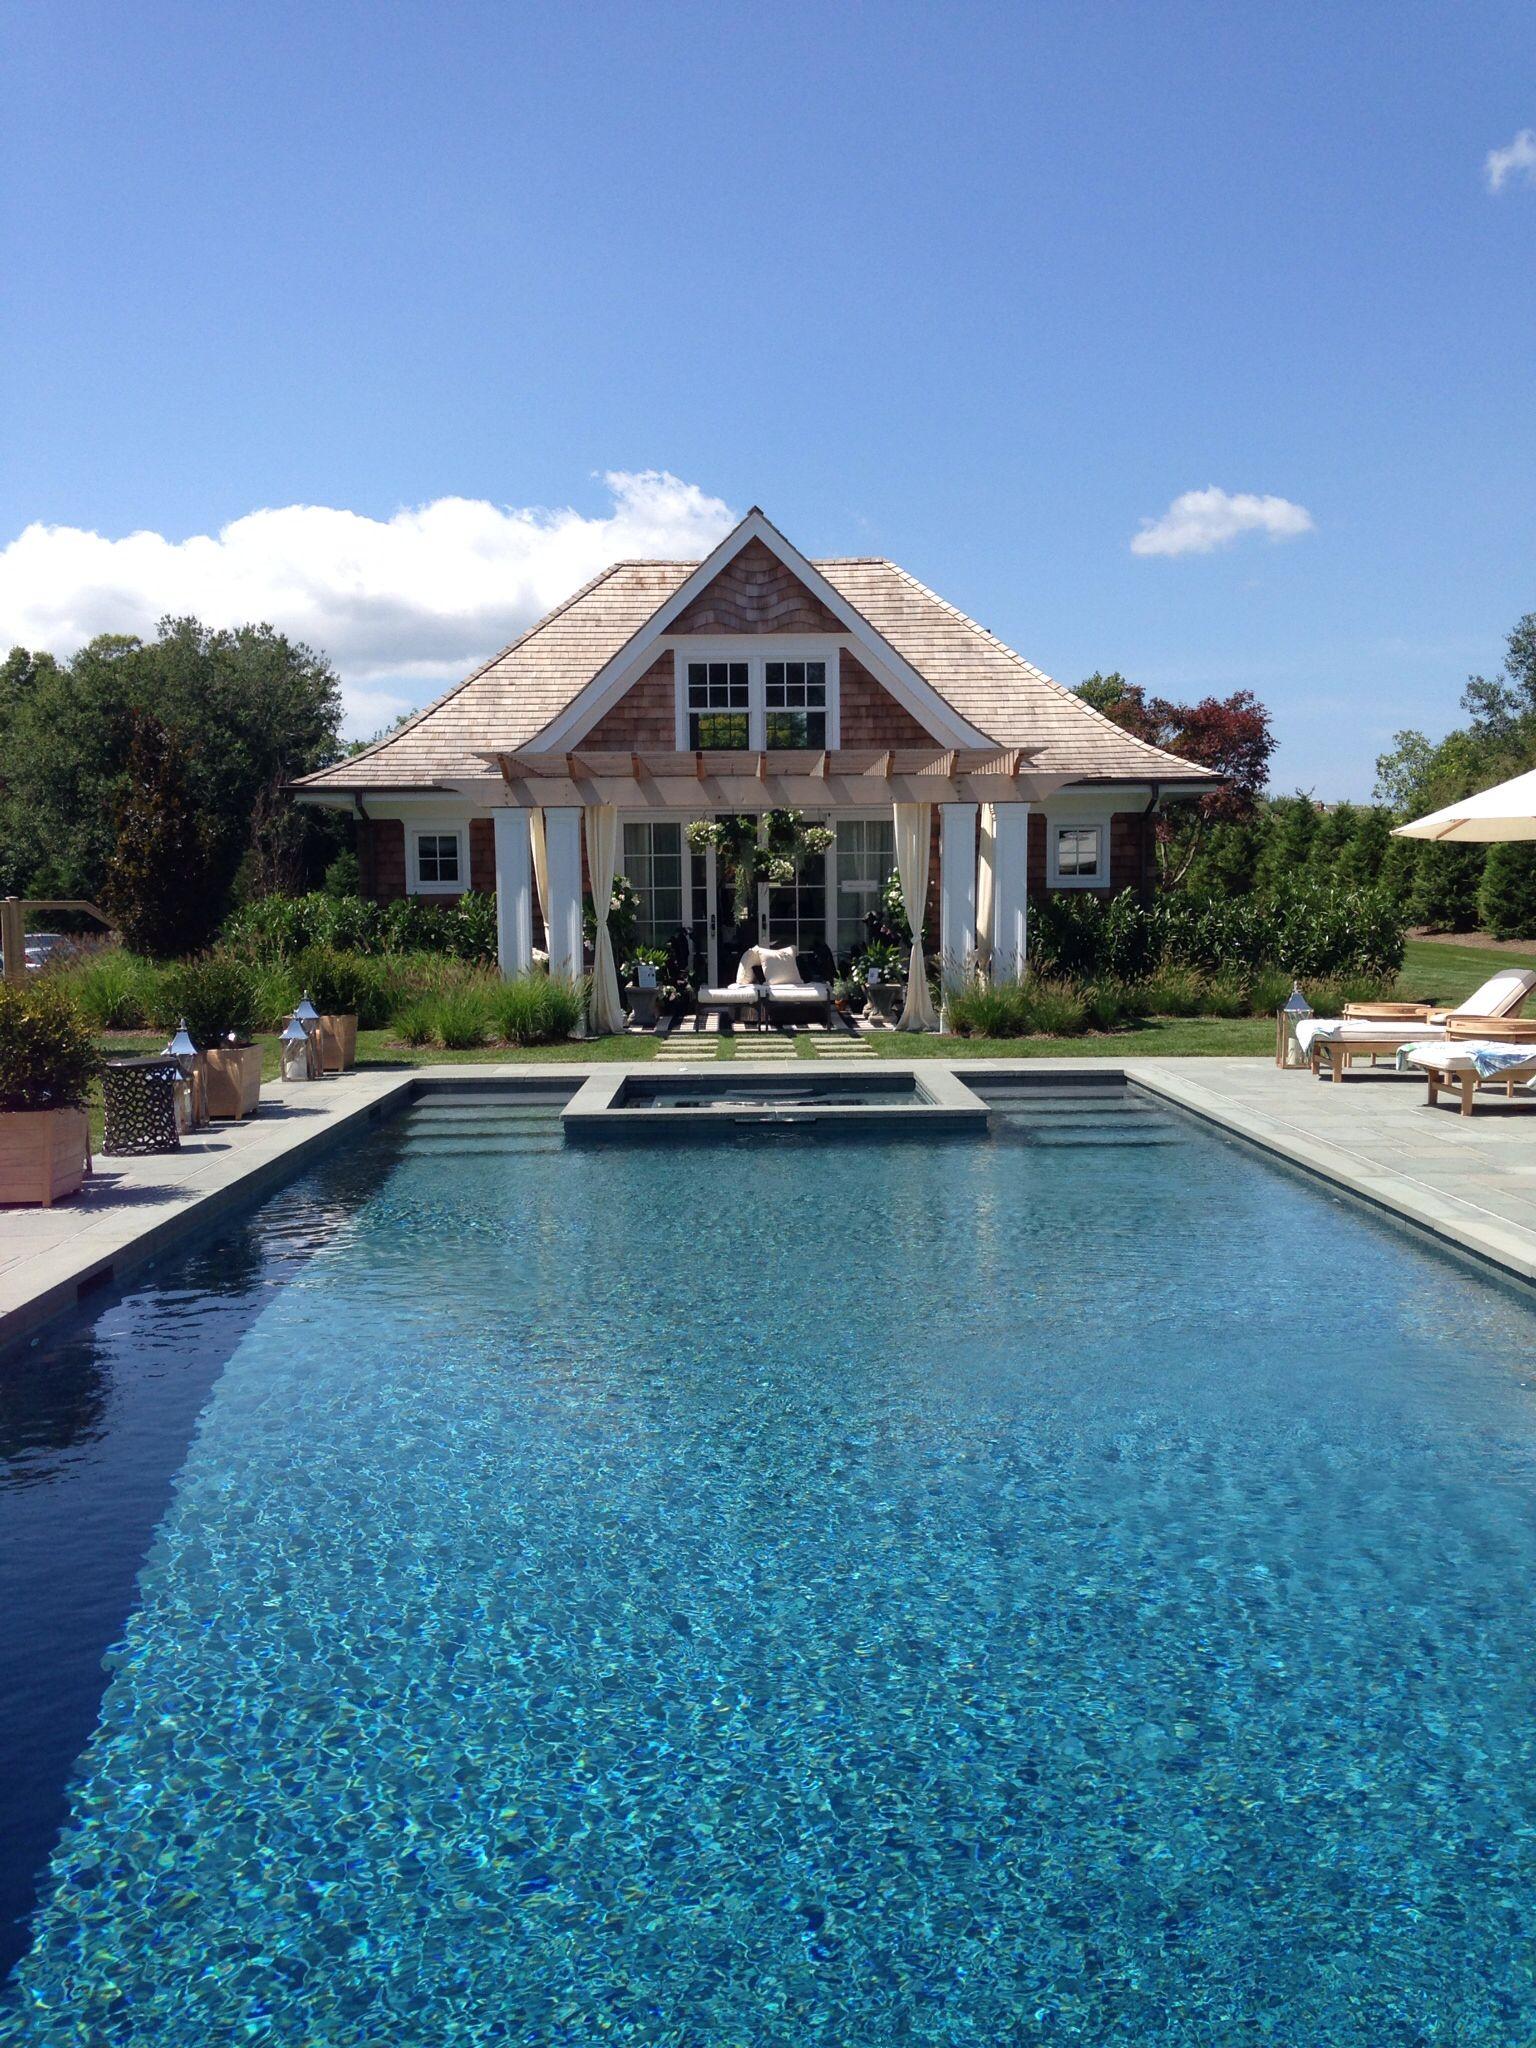 #poolhouse #outdoordesign #hamptondesignershowhouse